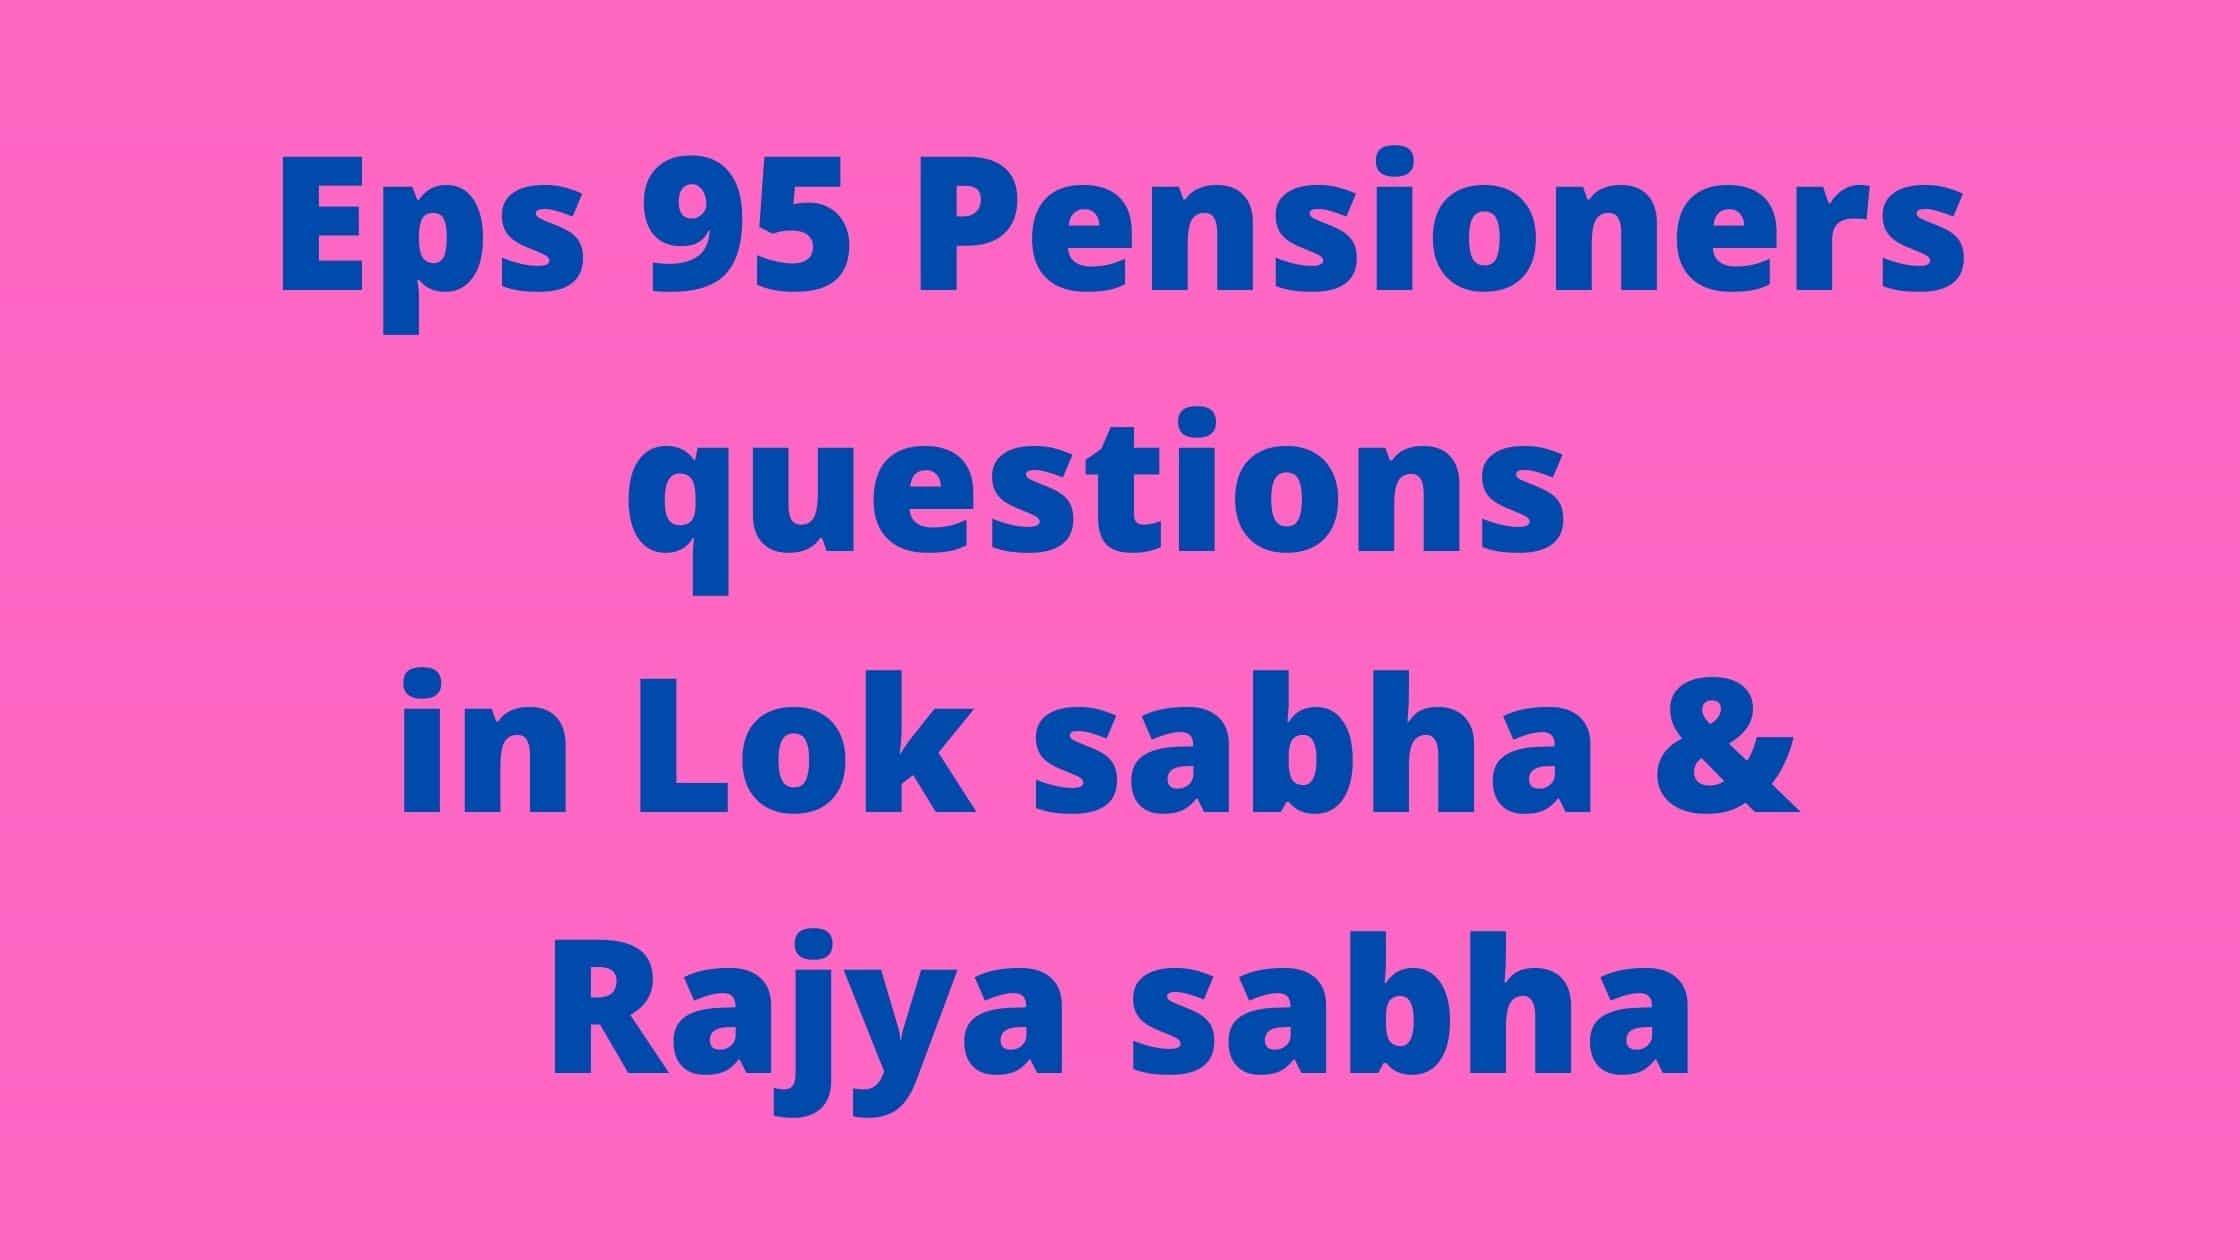 Eps 95 Pensioners questions in Lok sabha and Rajya sabha